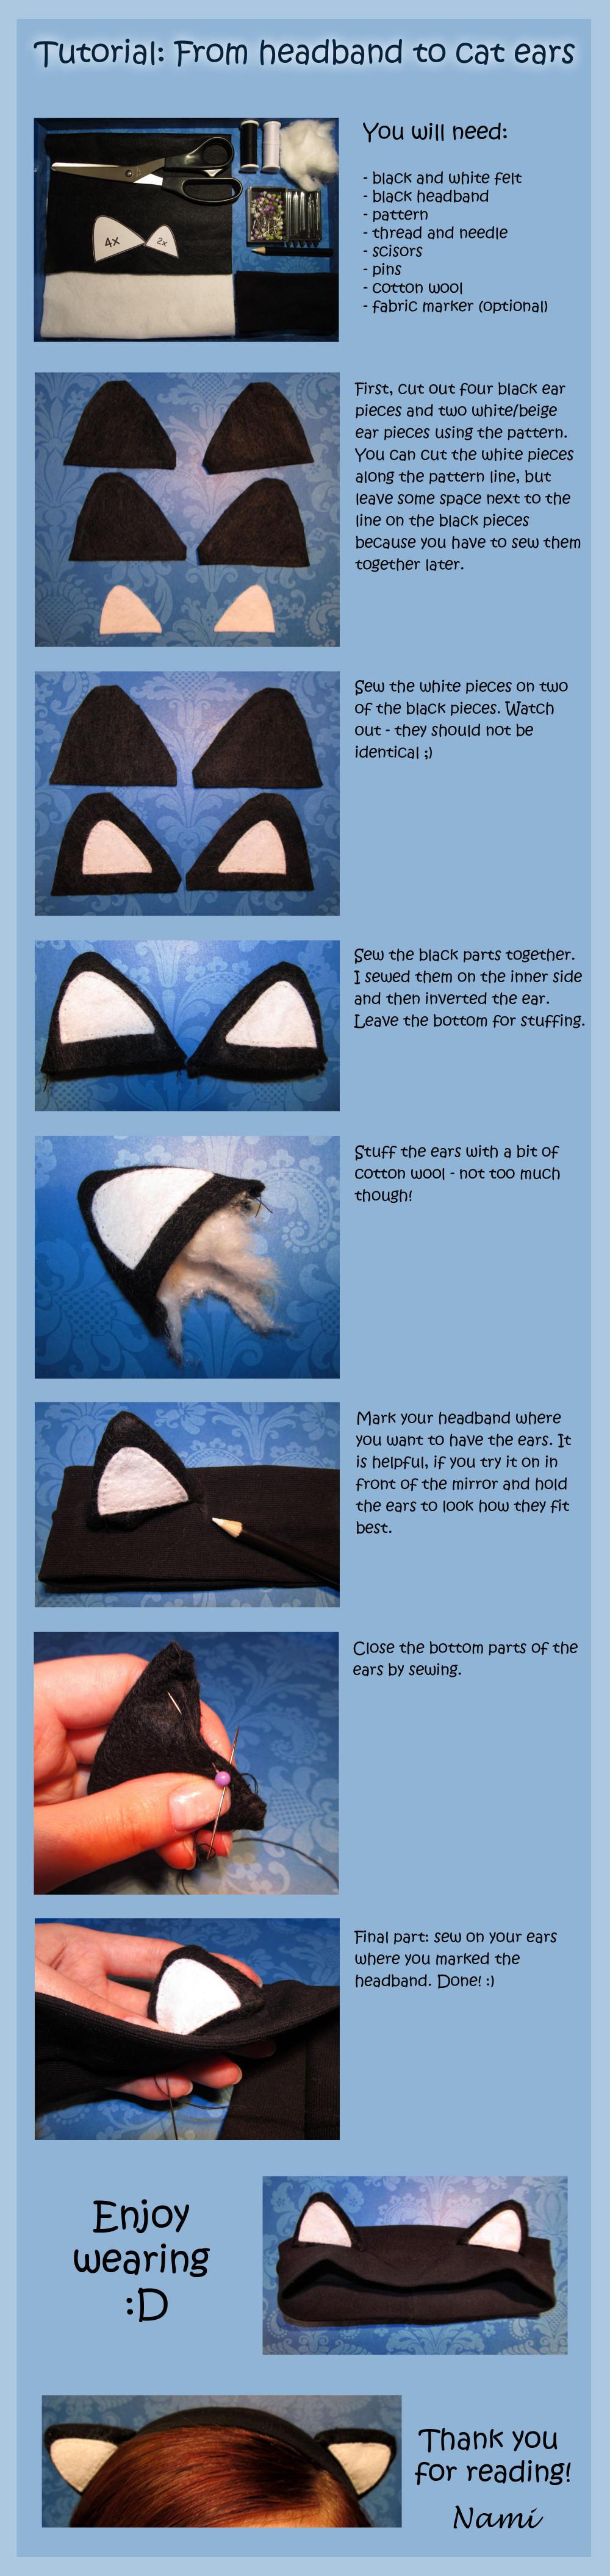 Tutorial: from headband to cat ears by PrincessNami